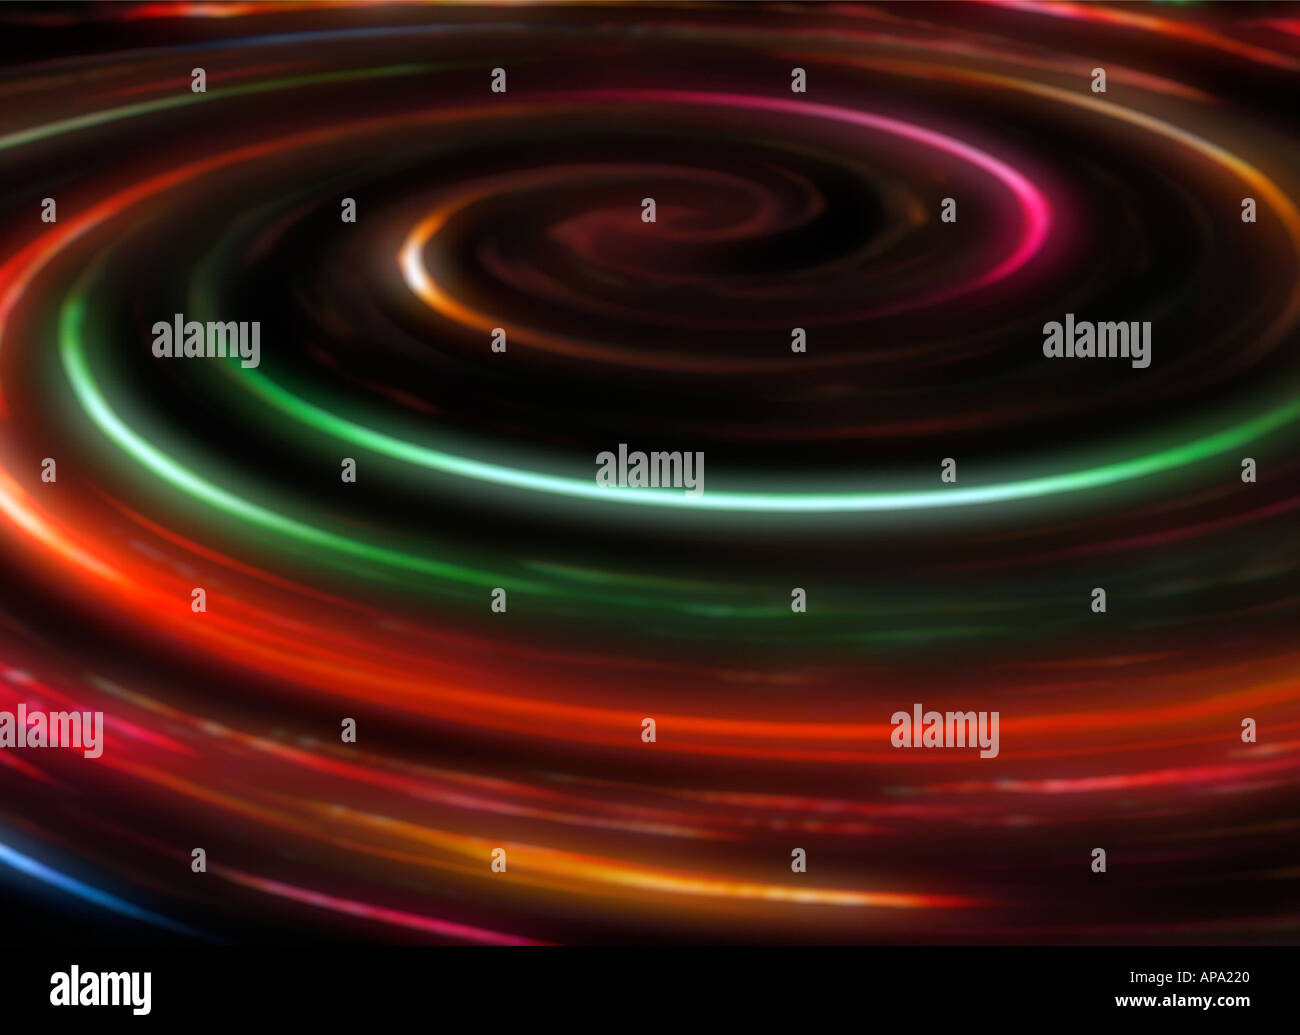 Liquid swirls abstract - Stock Image